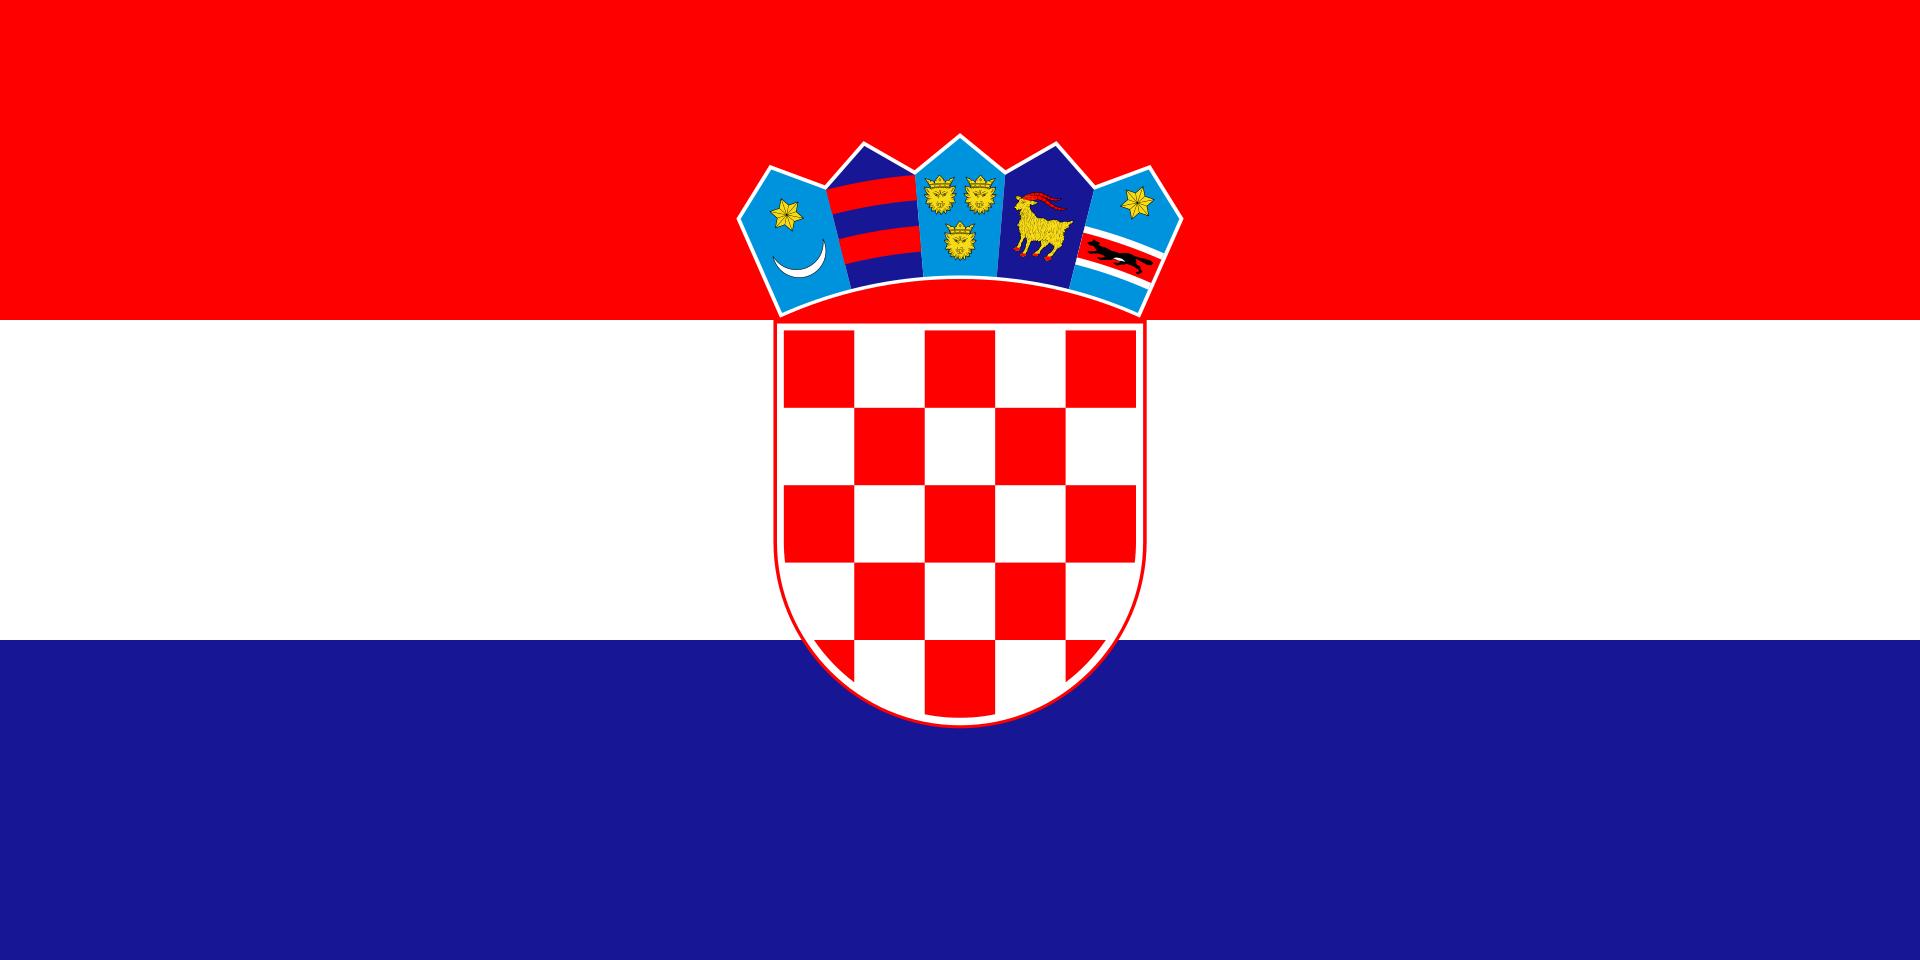 Croatia becomes the 28th member of the European Union